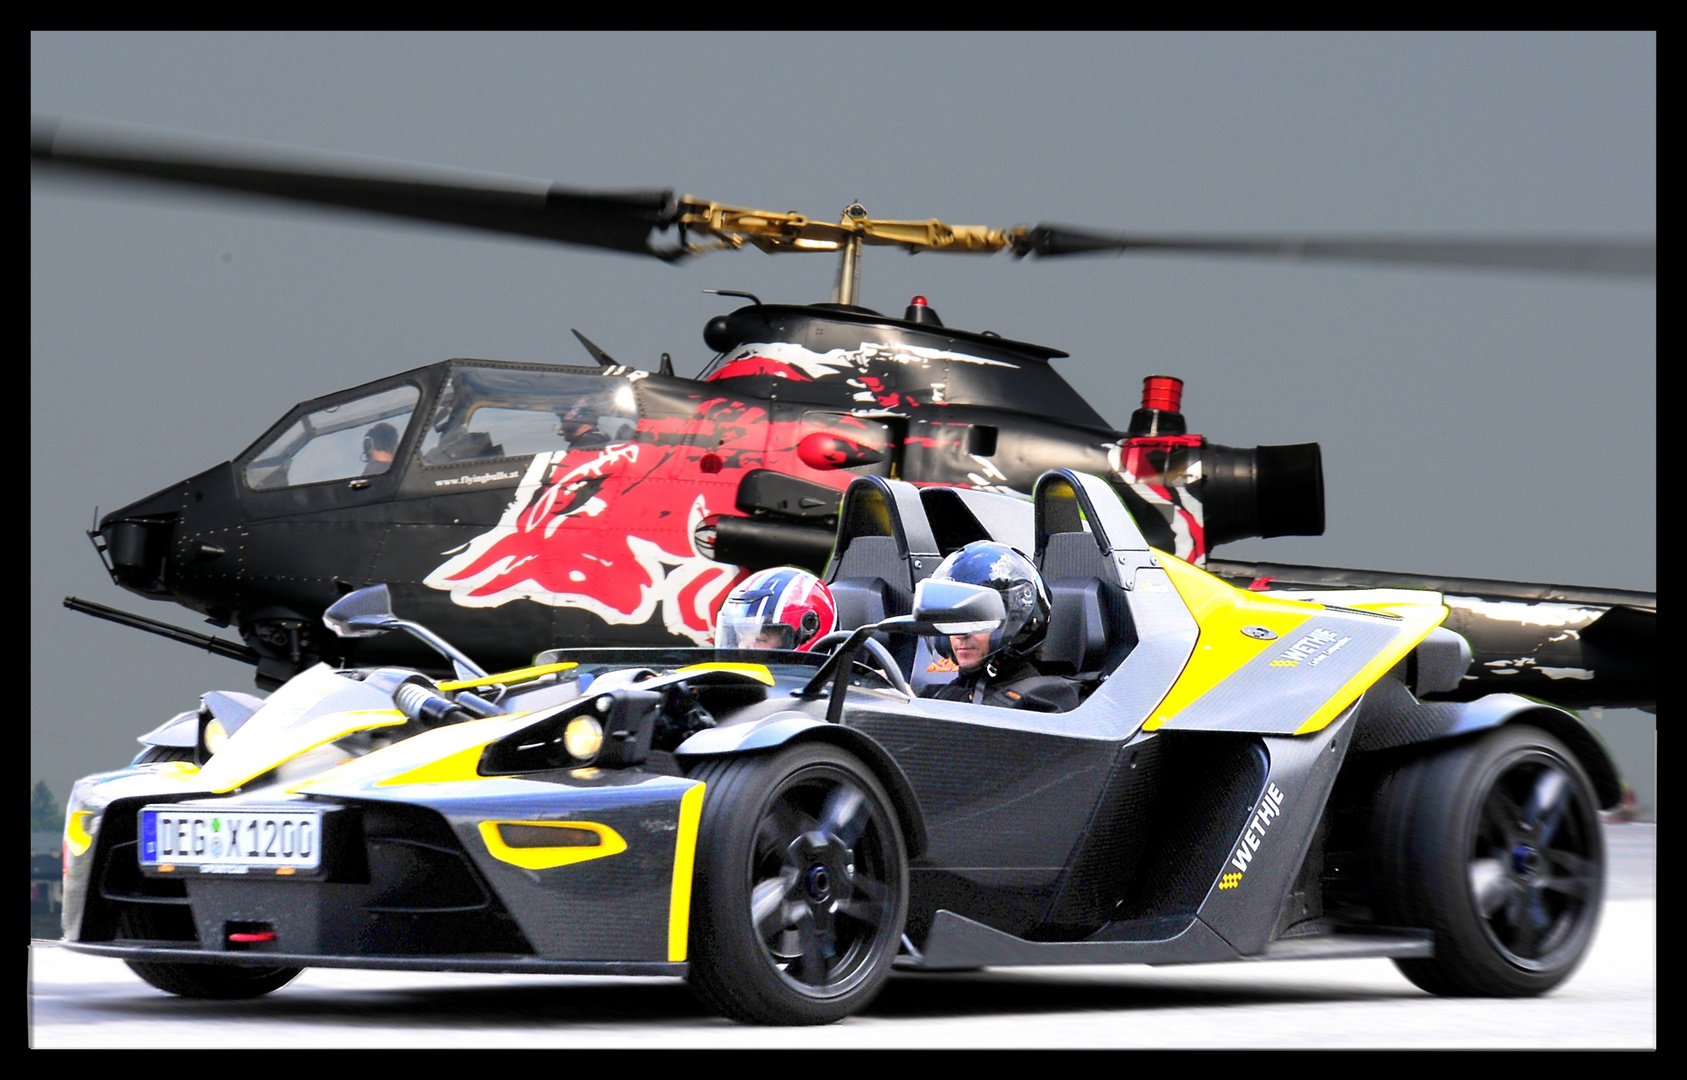 KTM 300 PS GEGEN COBRA